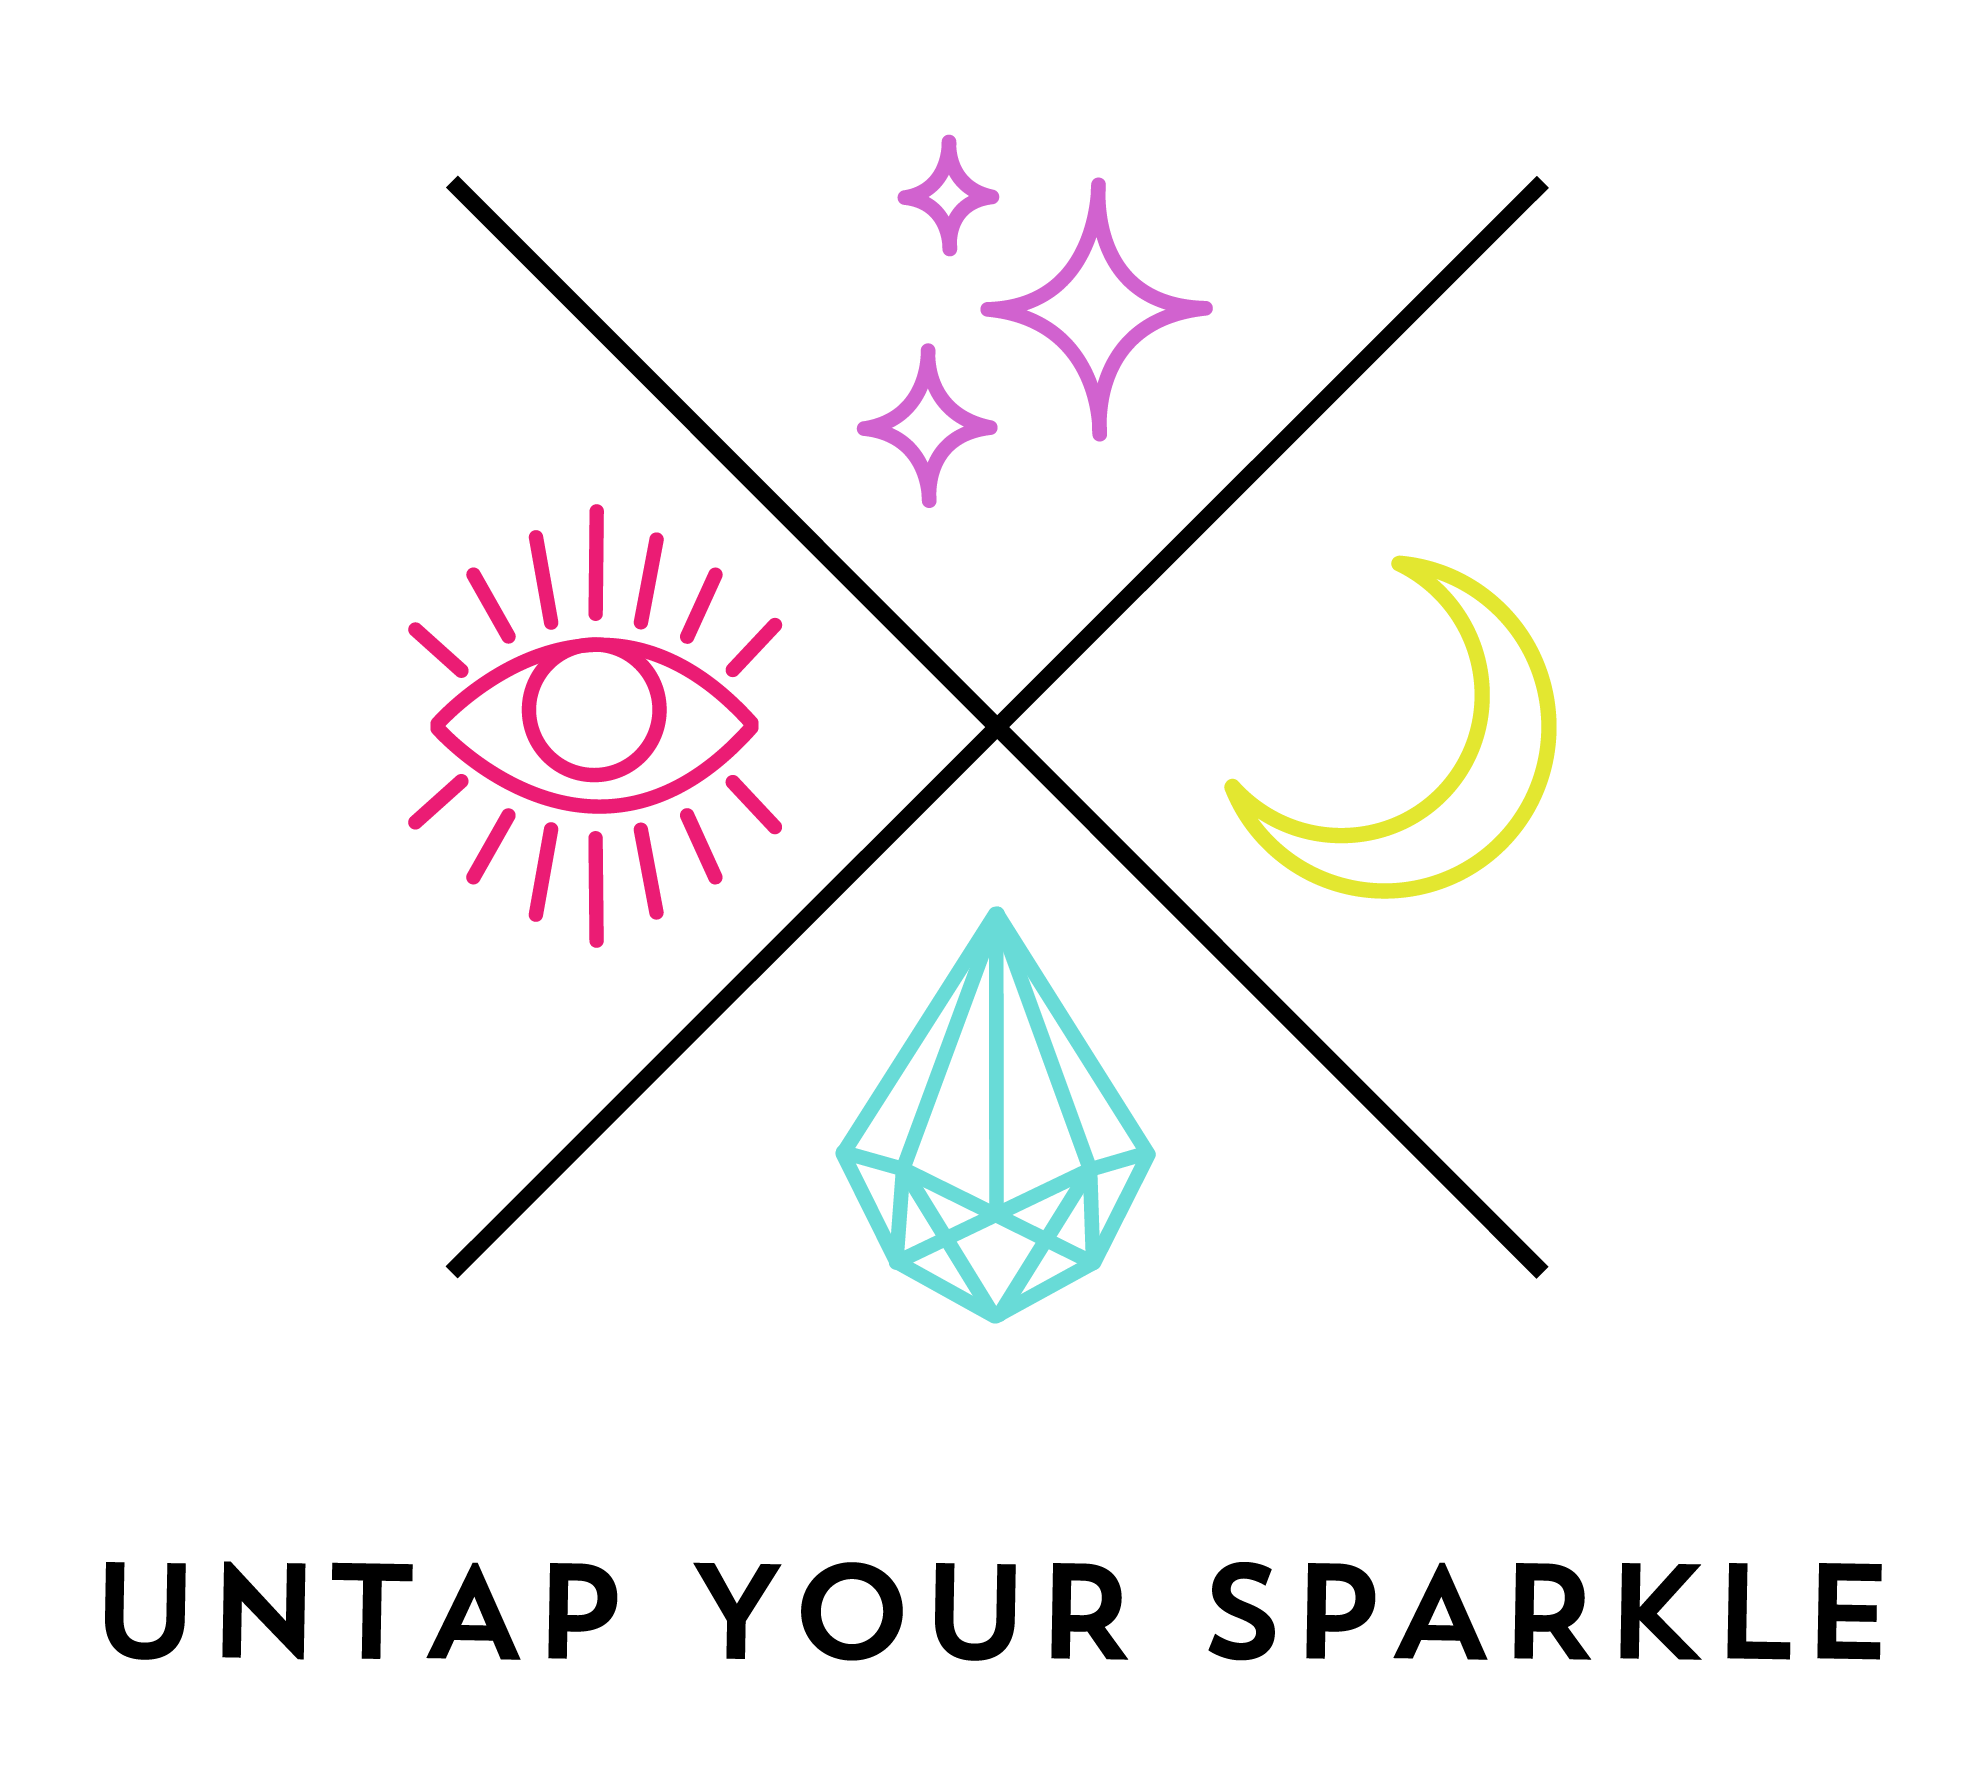 chakra sparkle an introduction to your energy centers untap your sparkle [ 1500 x 1342 Pixel ]